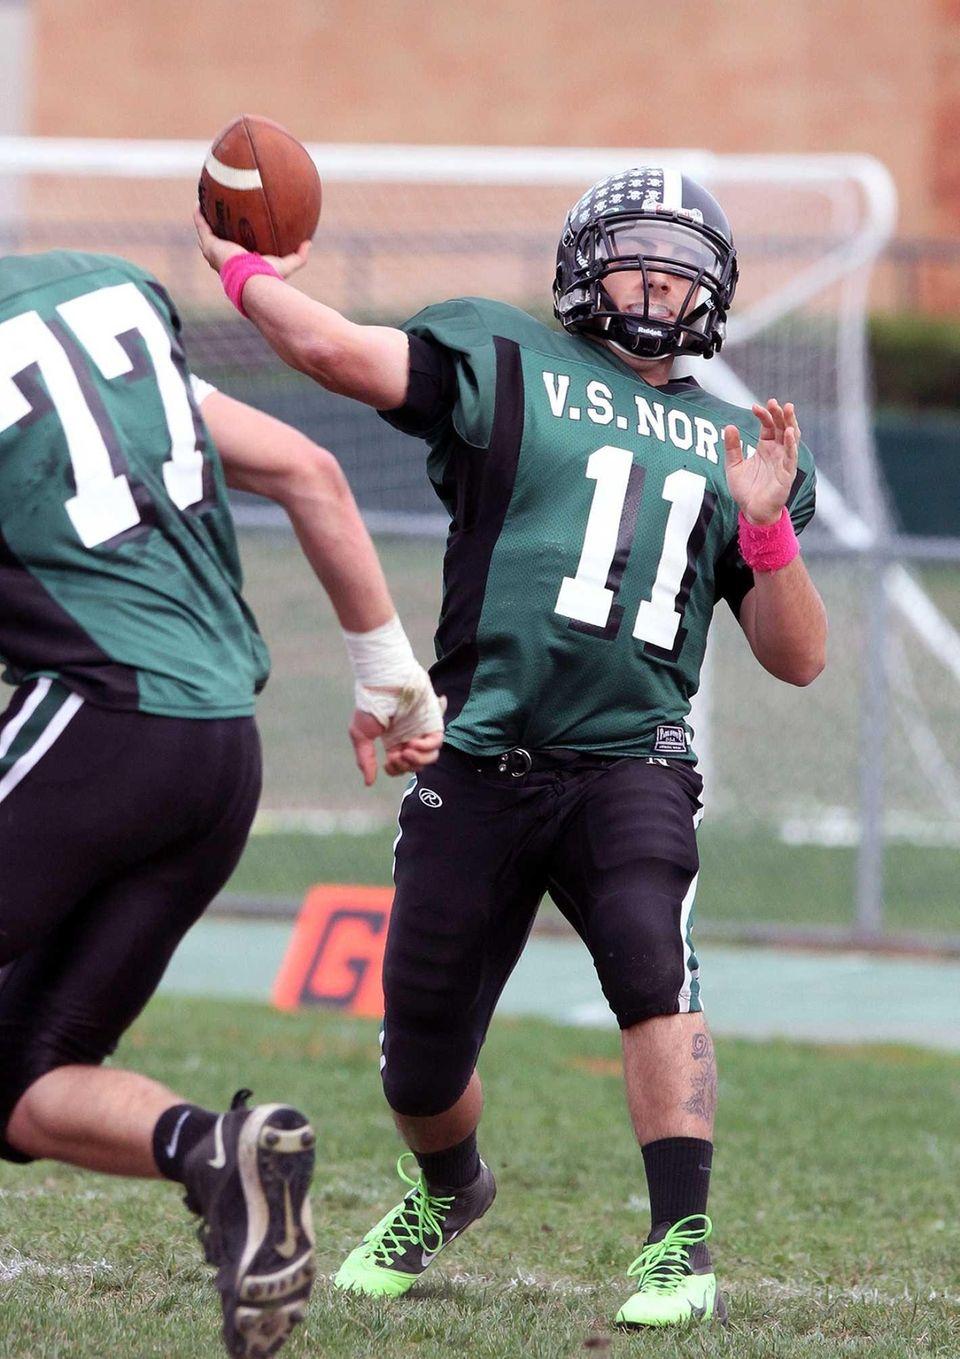 Valley Stream North quarterback Anthony Martelli fires down